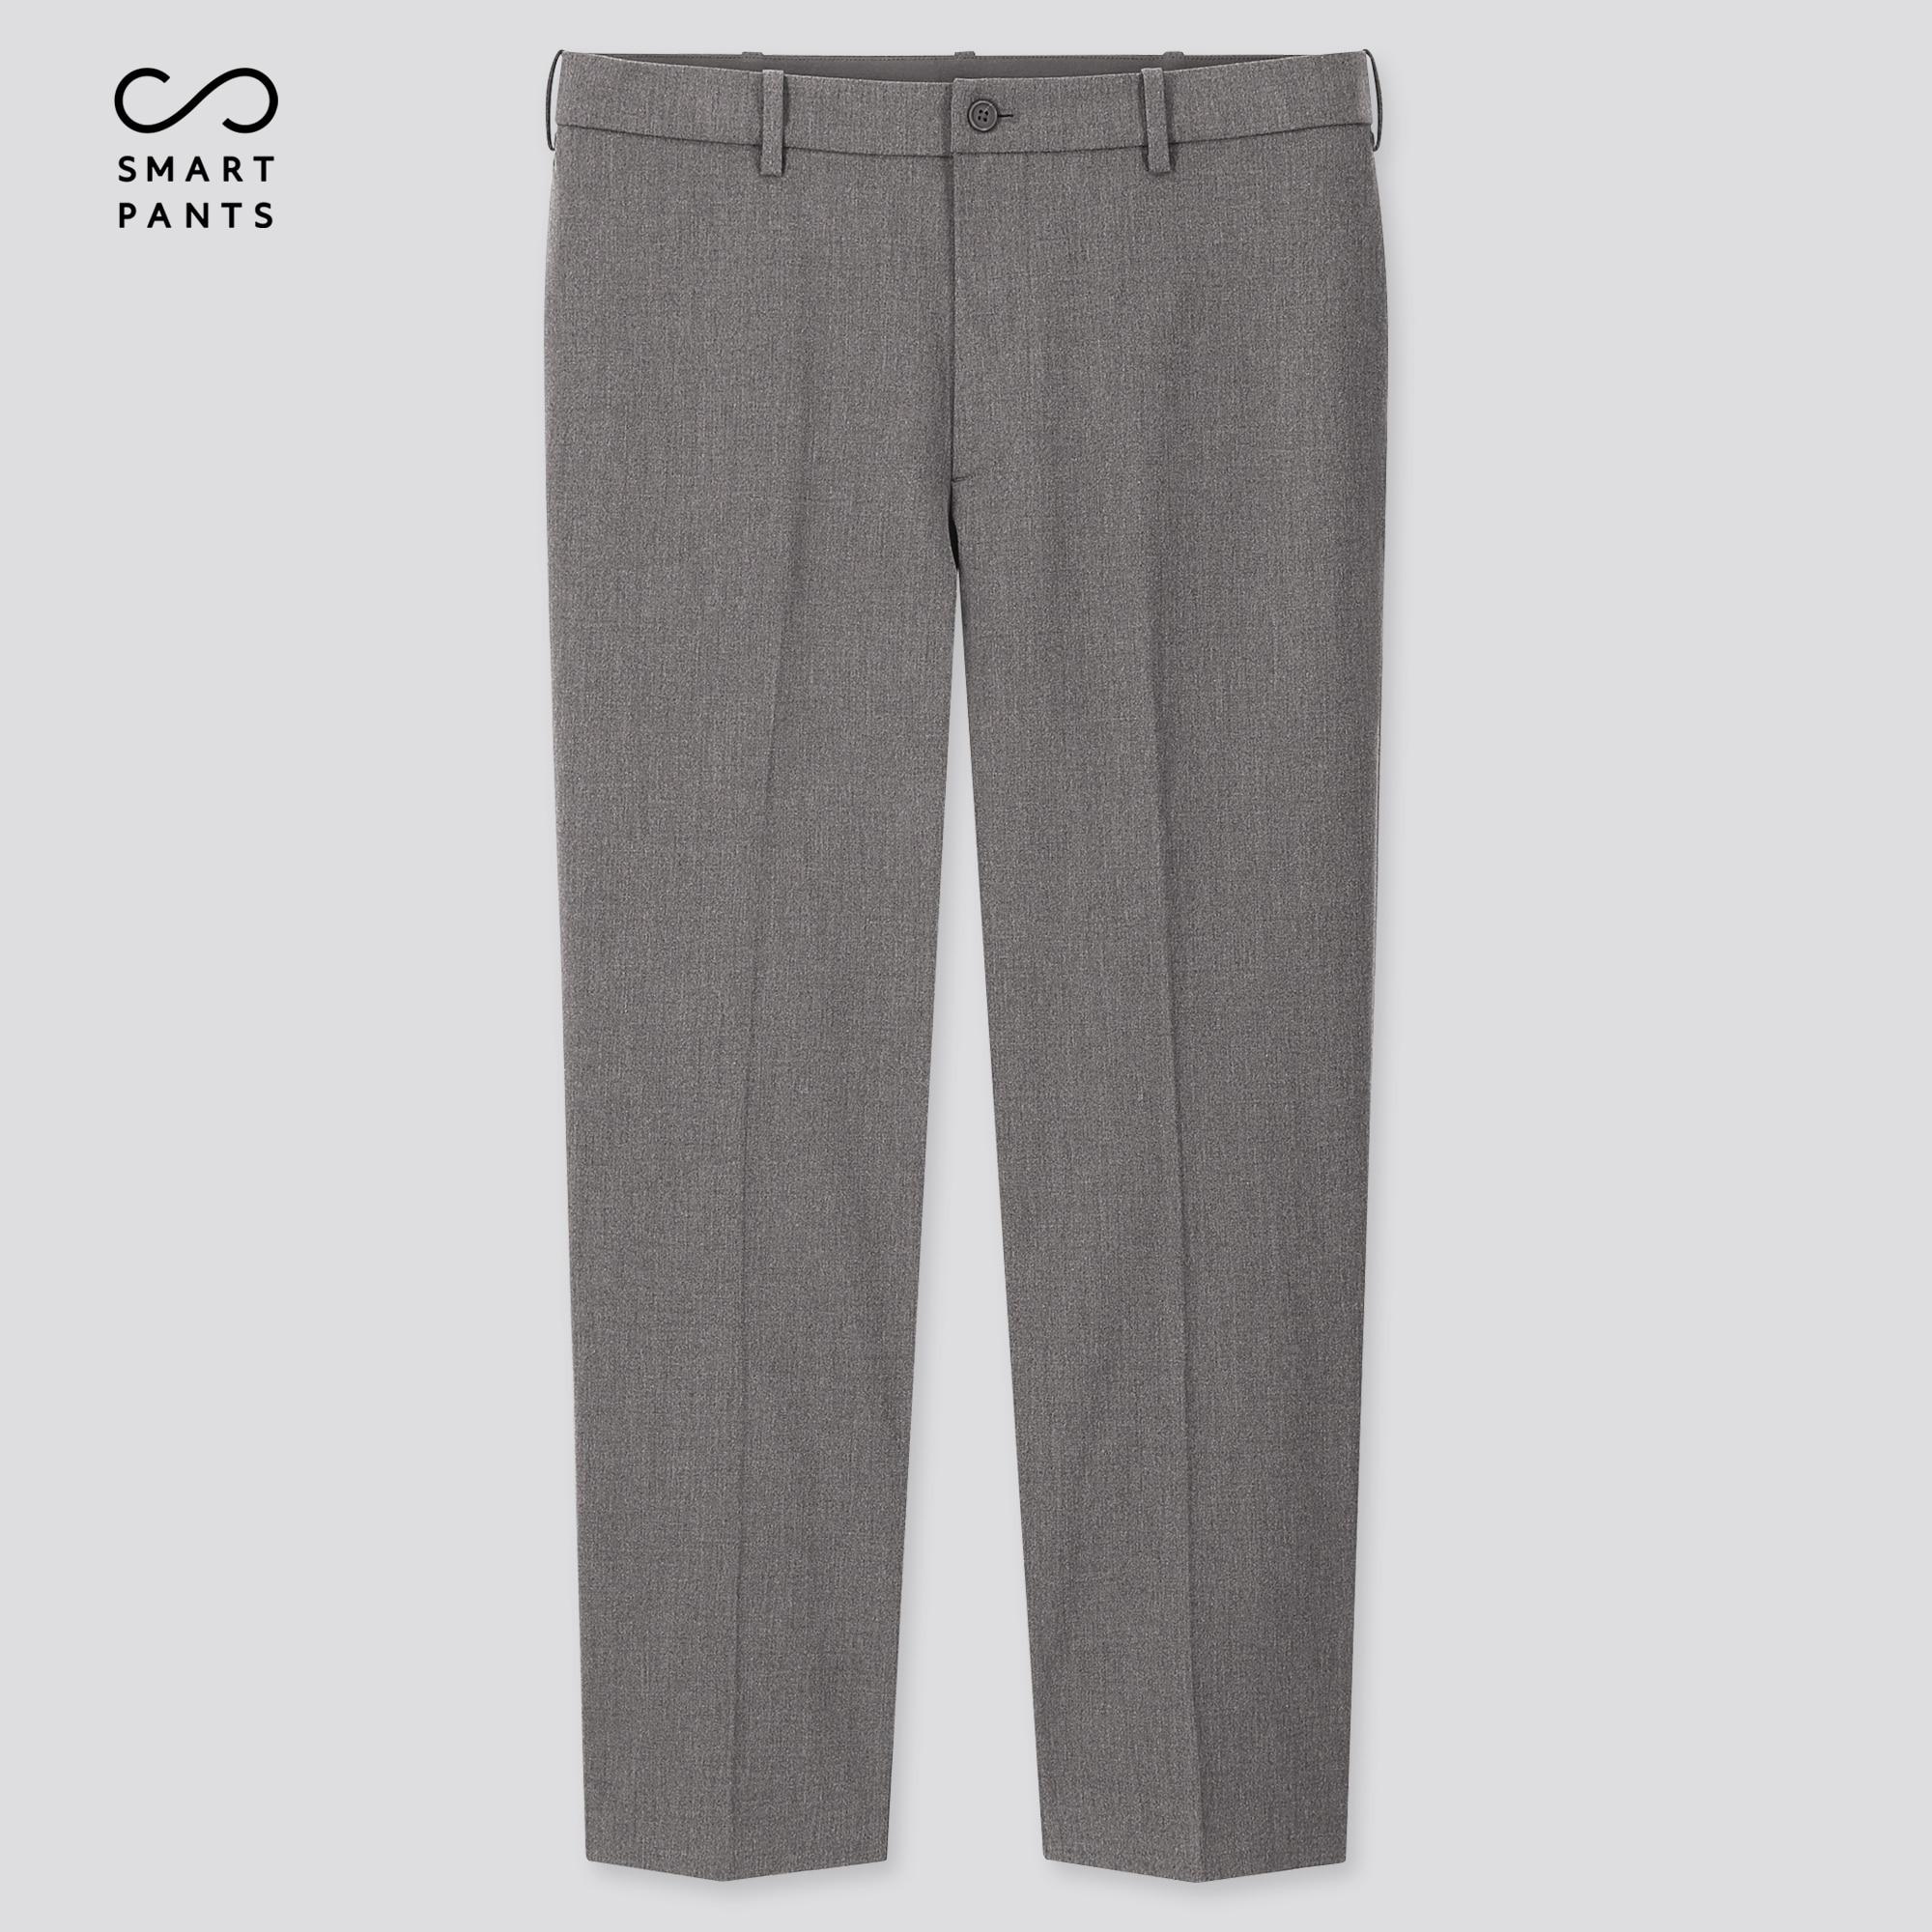 taille pantalon homme uniqlo